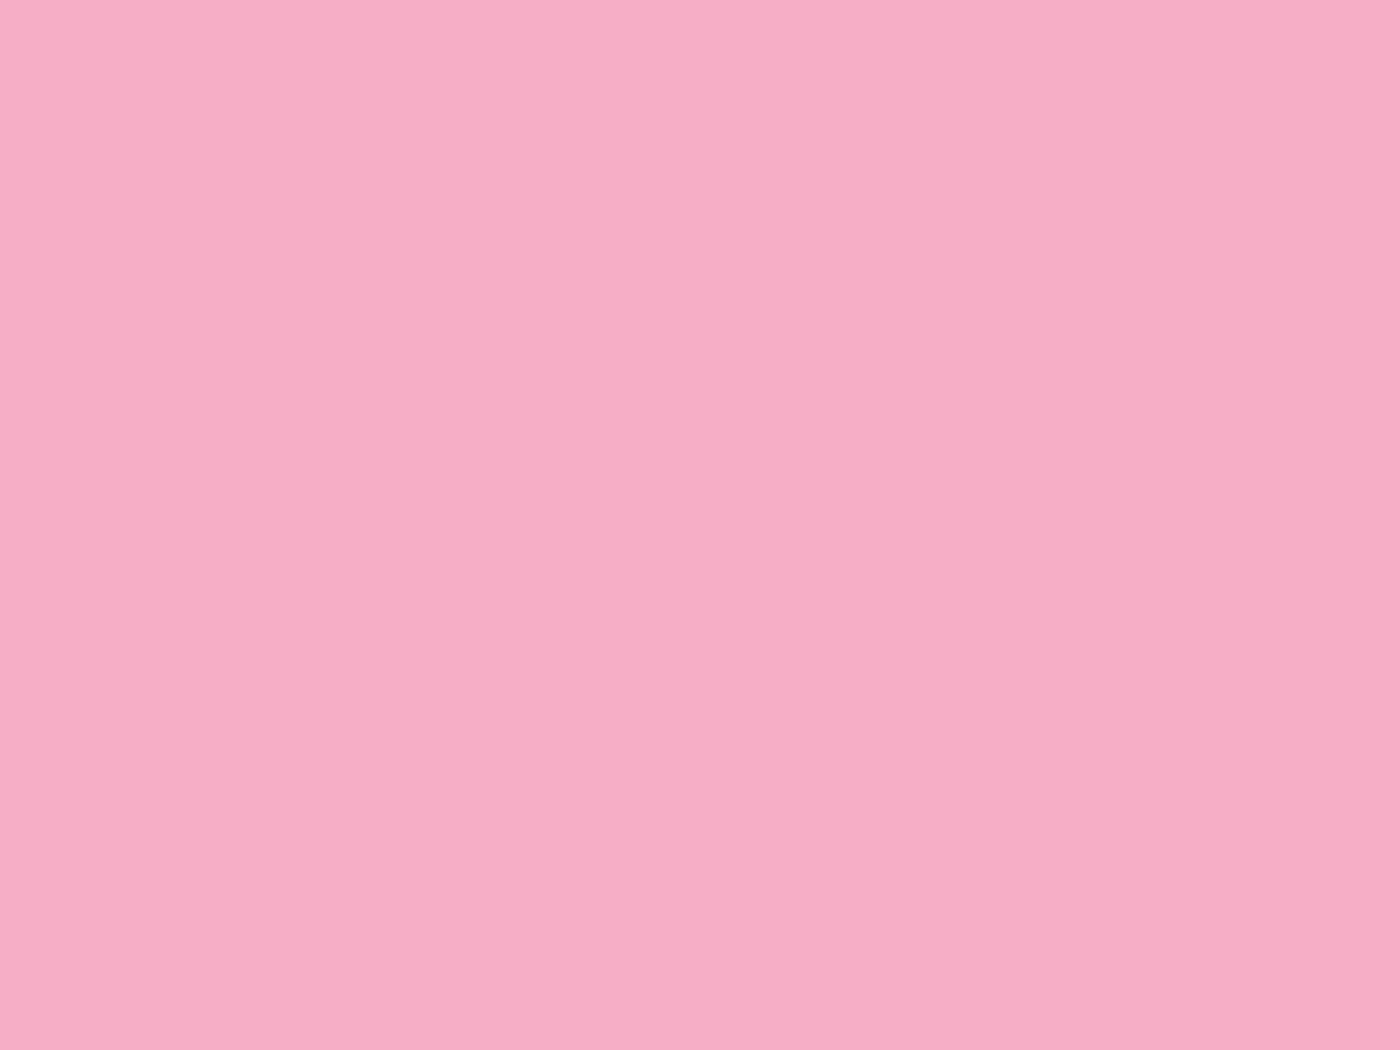 1400x1050 Nadeshiko Pink Solid Color Background